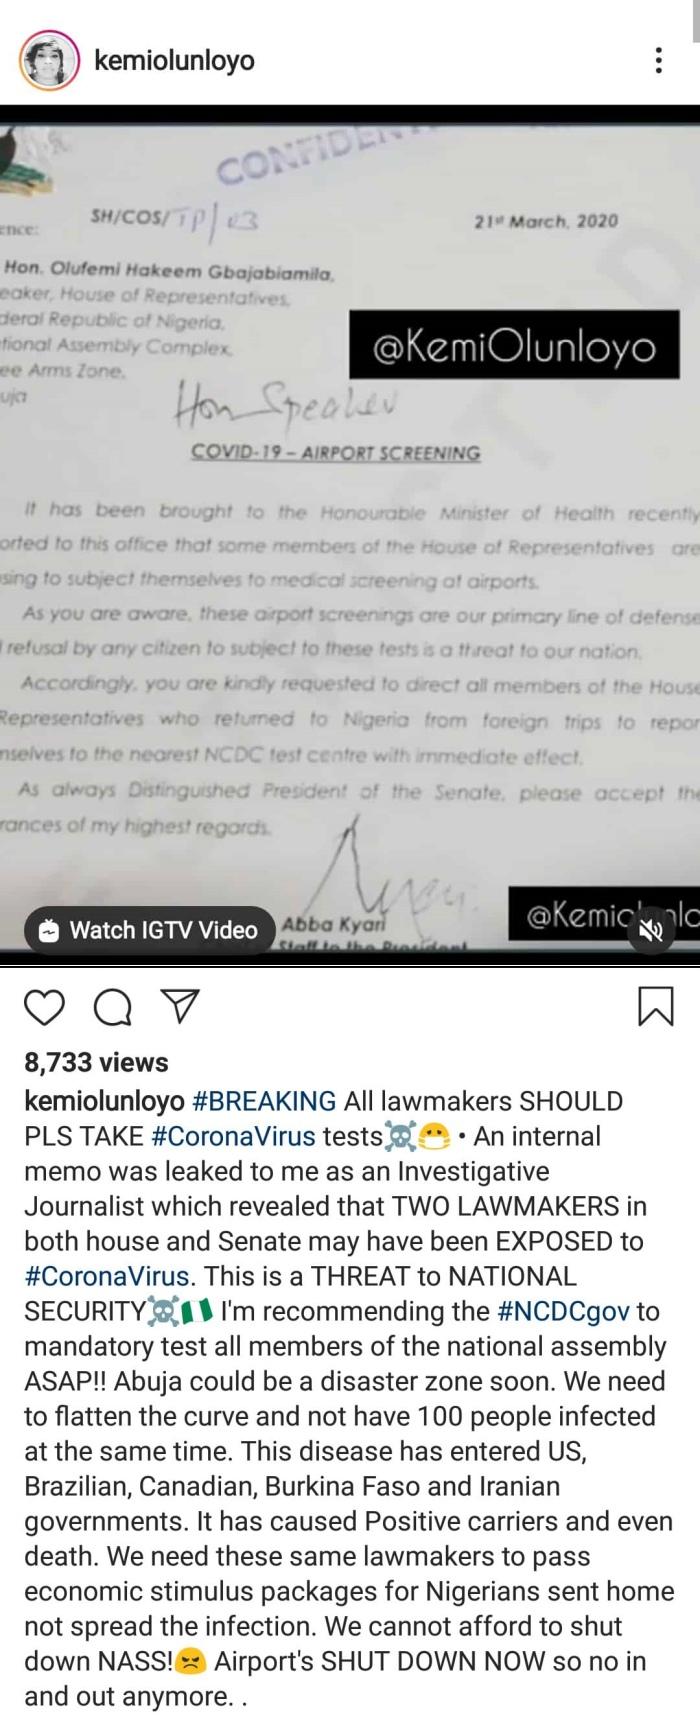 "Coronavirus: ""Abuja could be a disaster zone soon"", Kemi Olunloyo says"